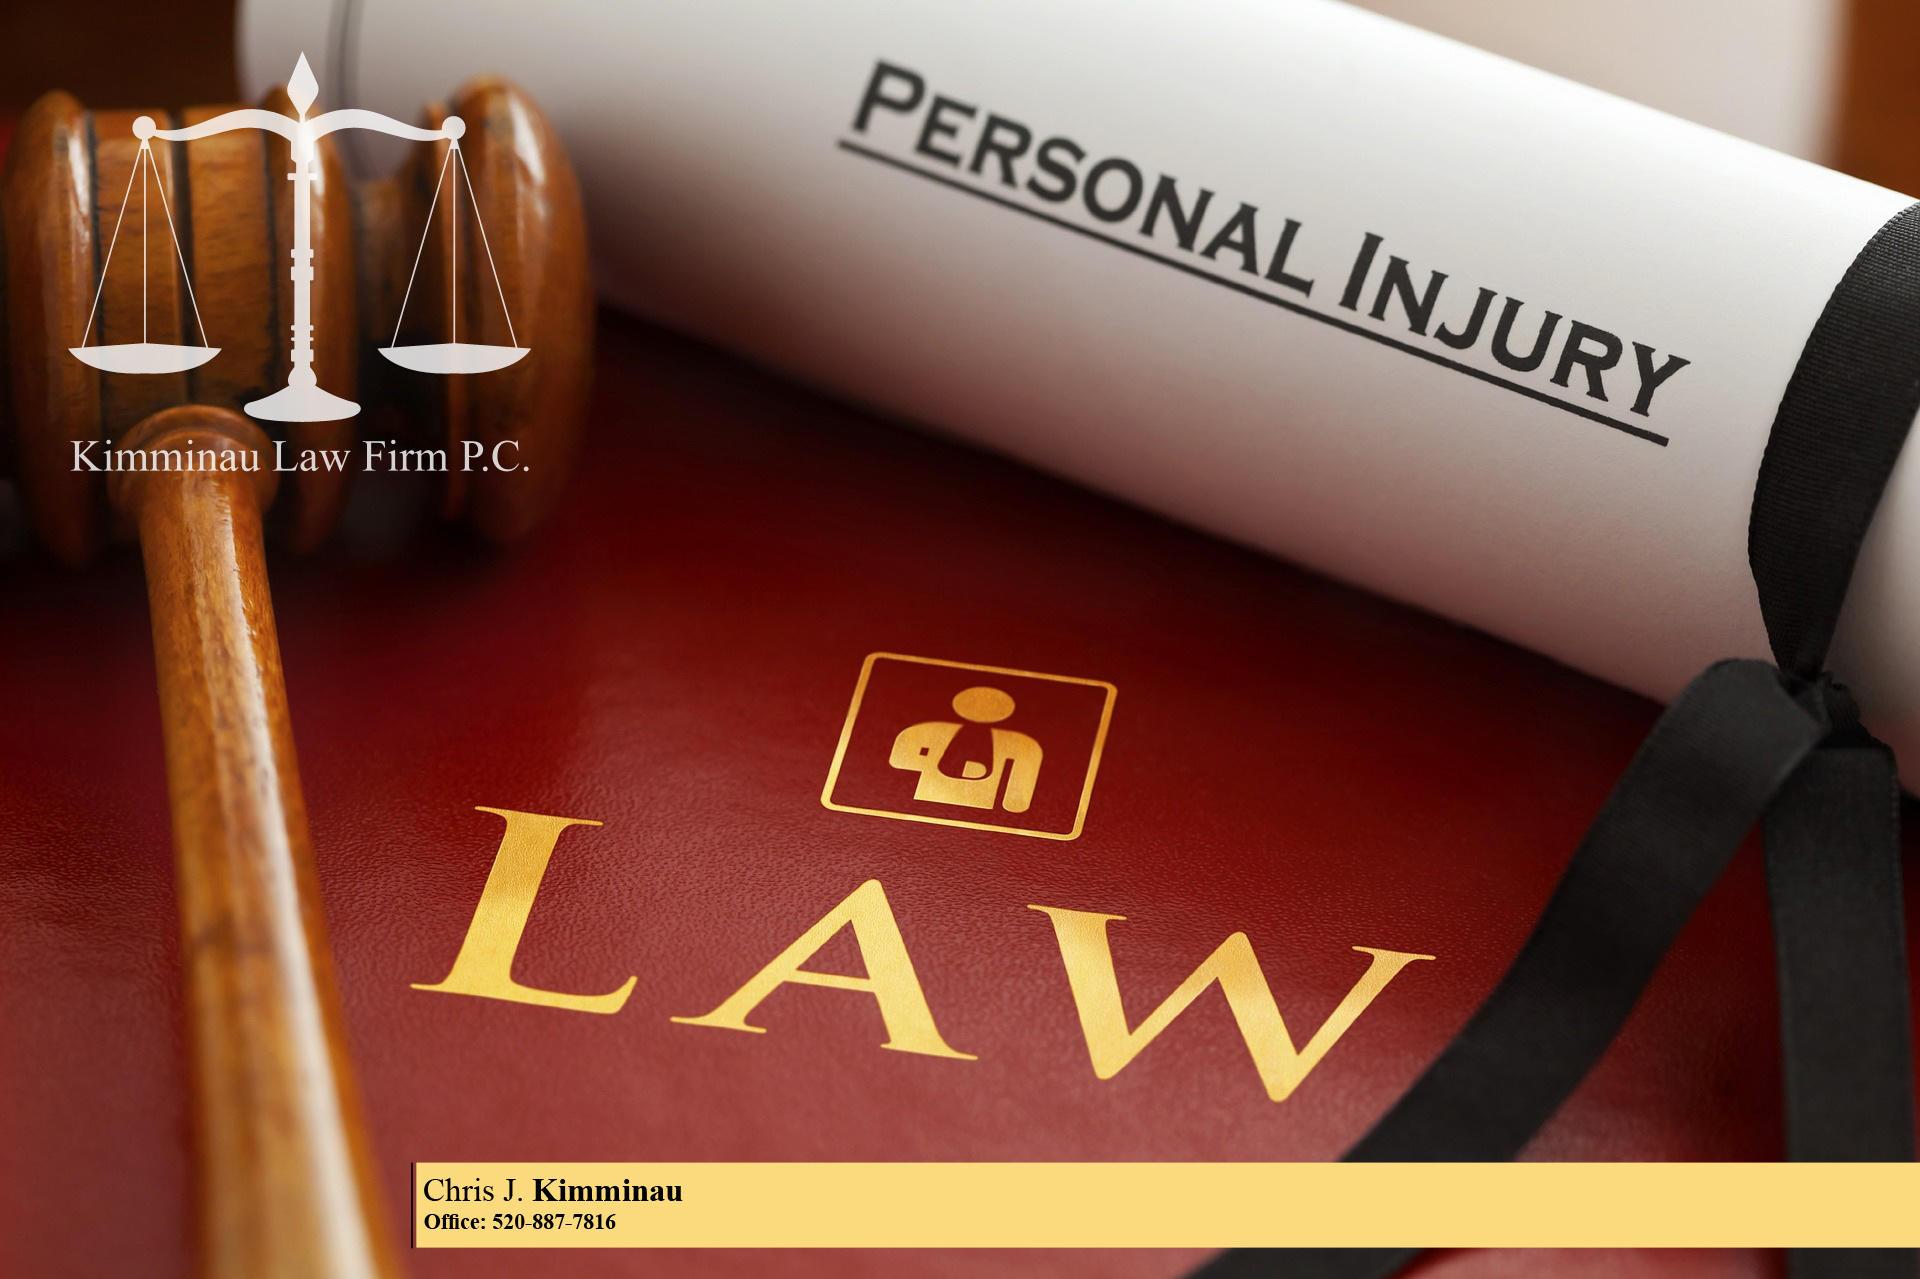 Kimminau Law Firm P.C.